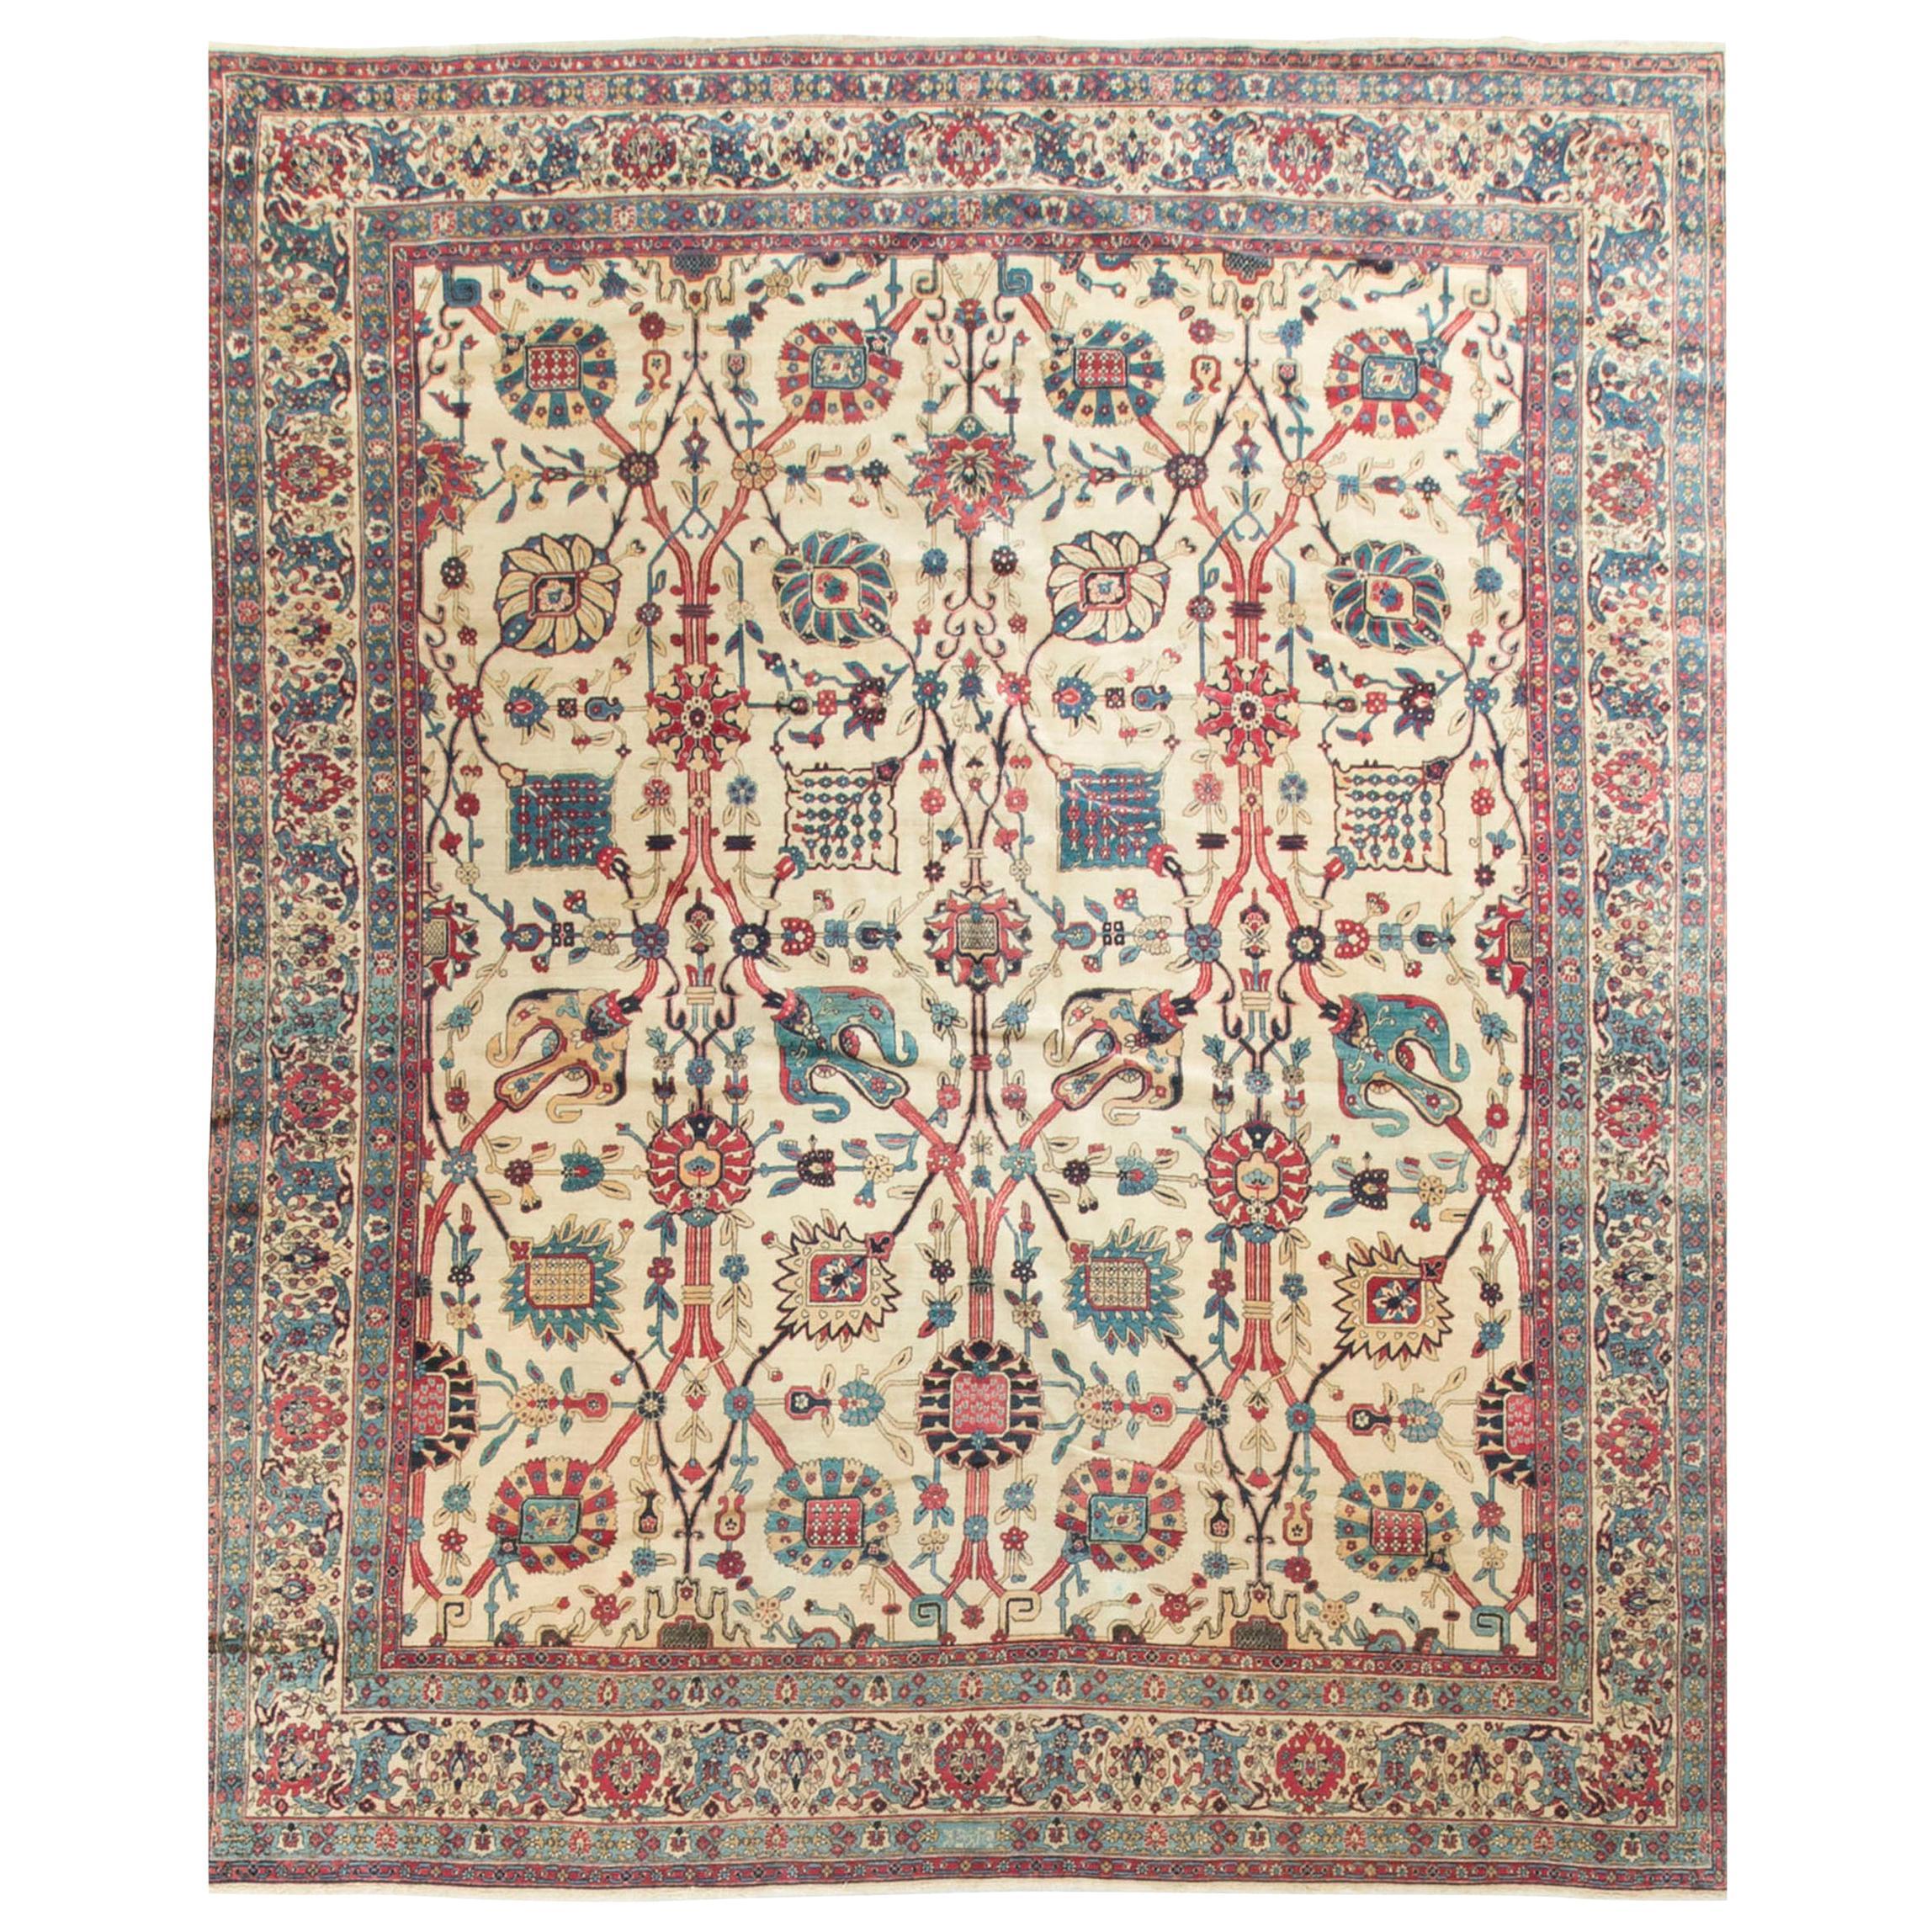 Antique Persian Kerman Lavar Rug Carpet, circa 1900